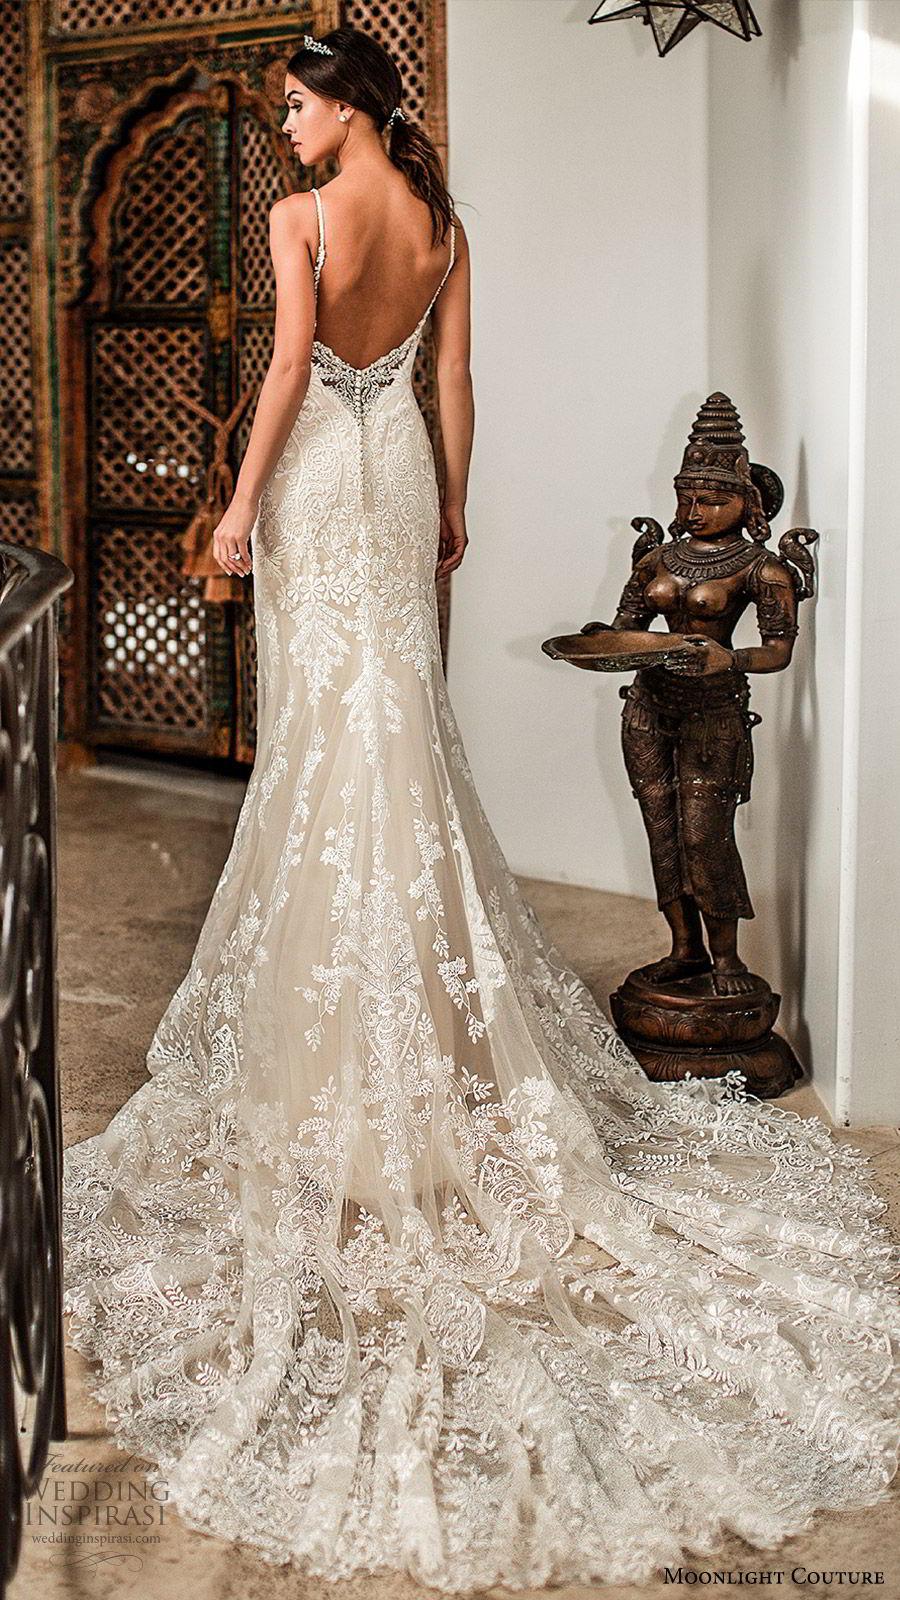 moonlight couture fall 2019 bridal sleeveless thin straps v neckline fully embellished lace sheath fit flare mermaid wedding dress (4) elegant low back chapel train champagne bv